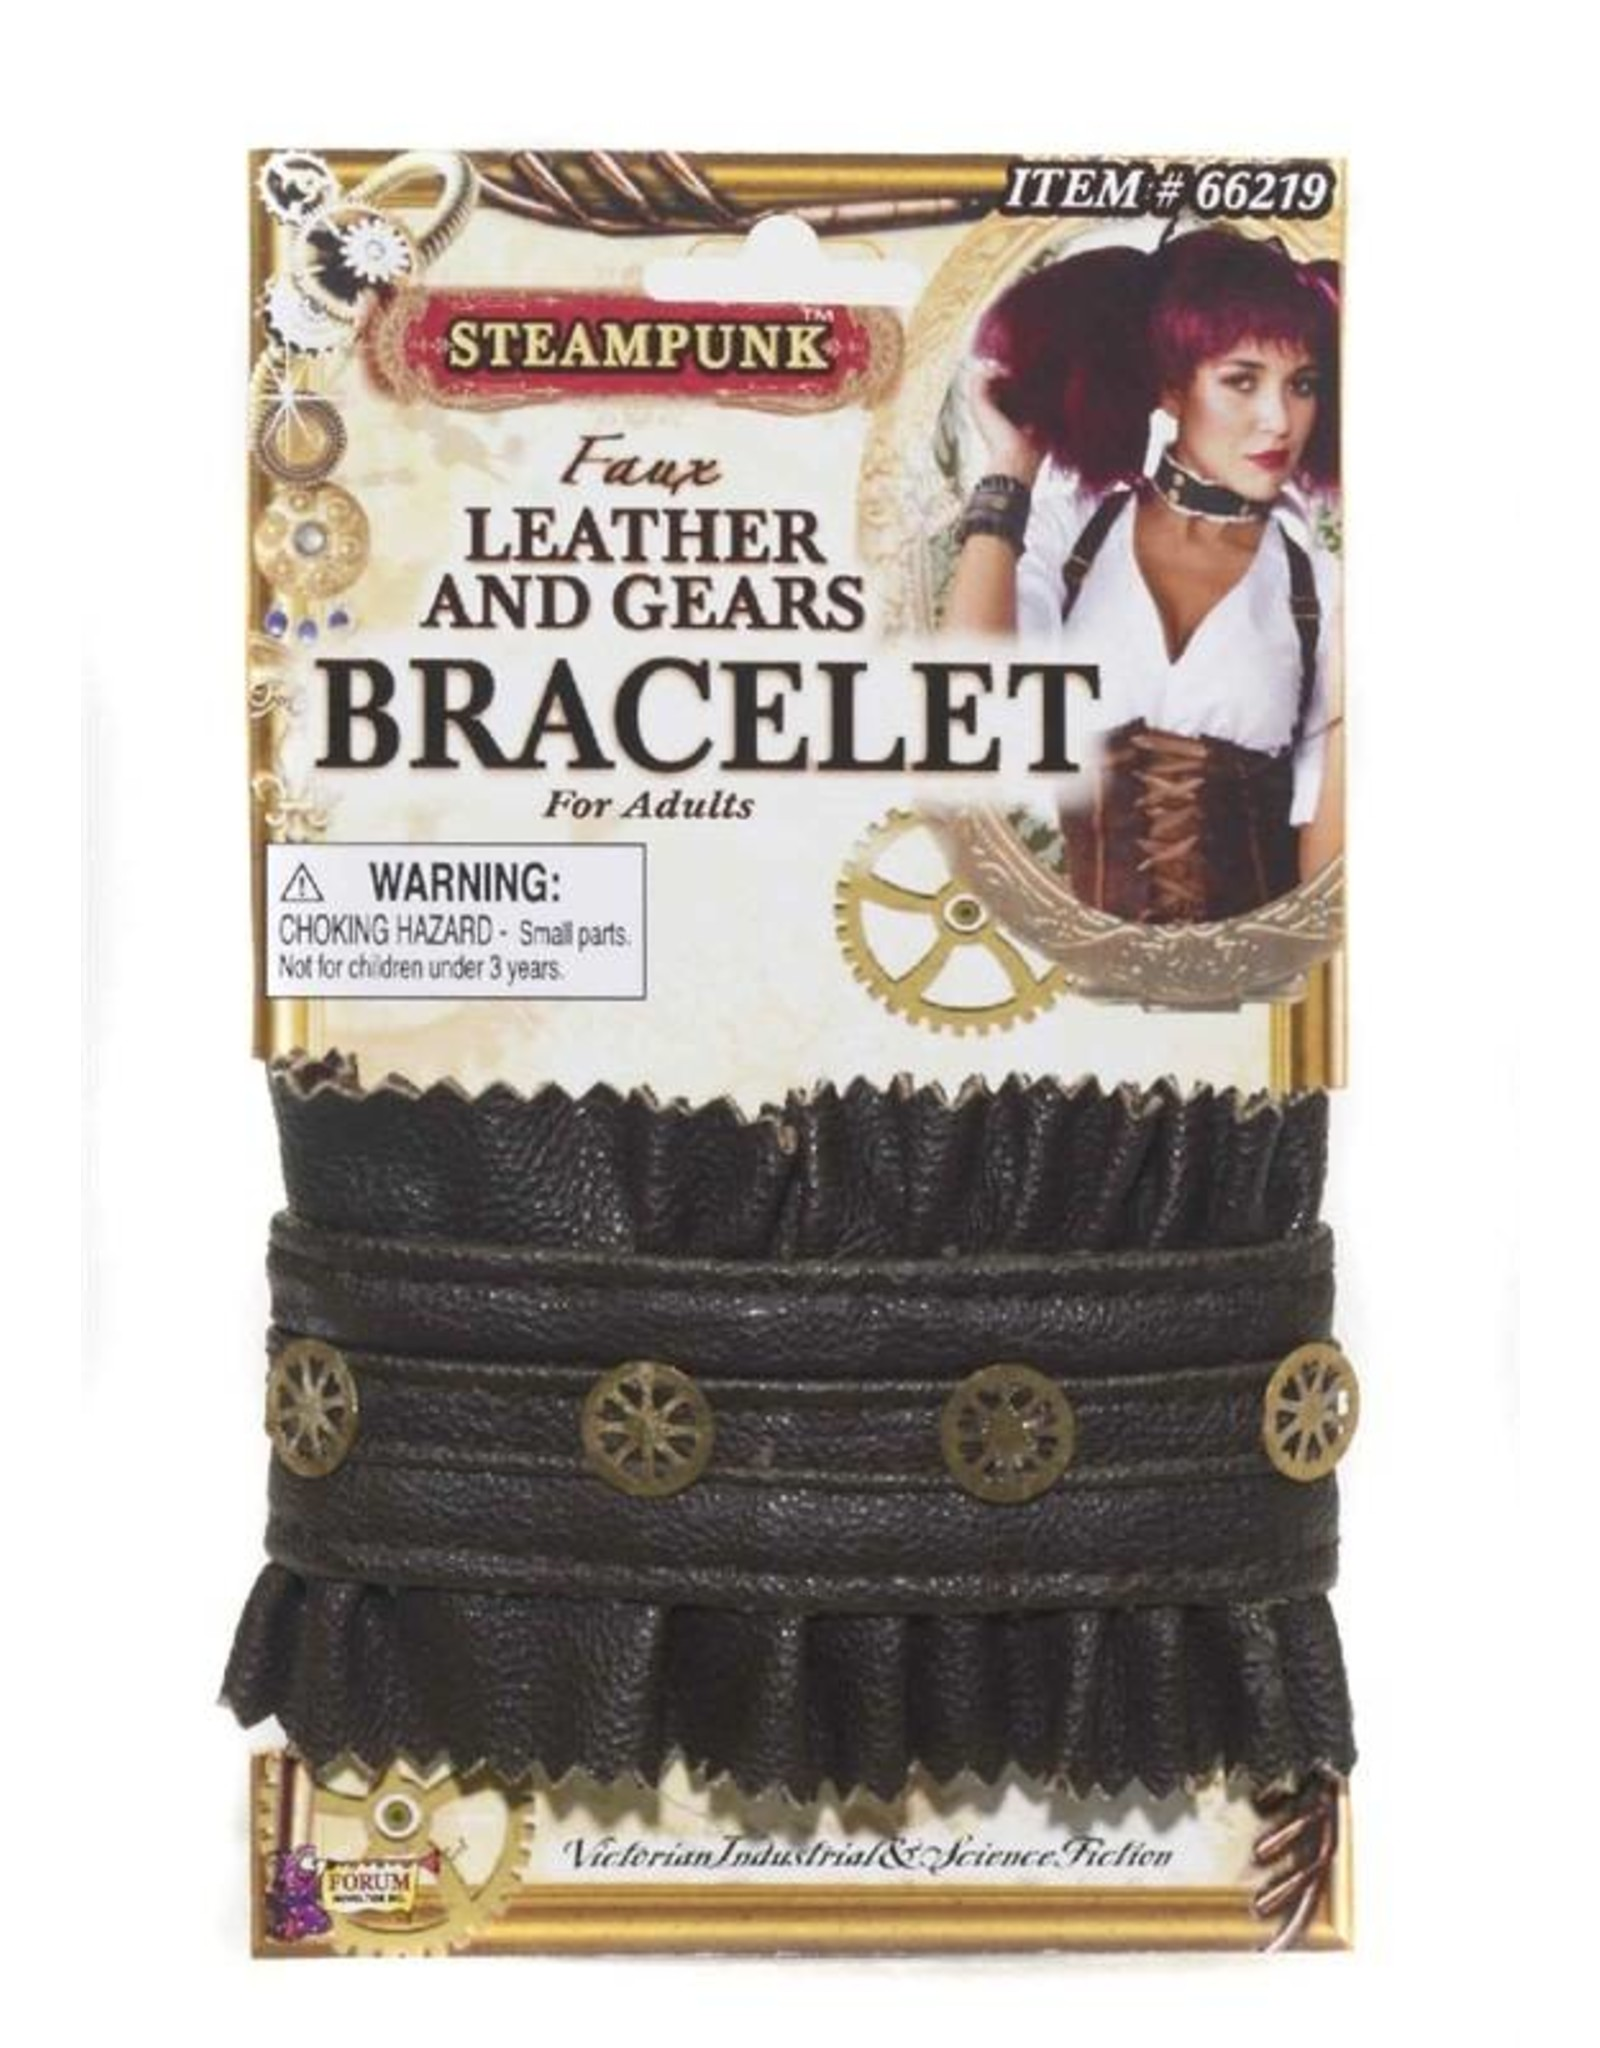 Forum Steampunk Bracelet